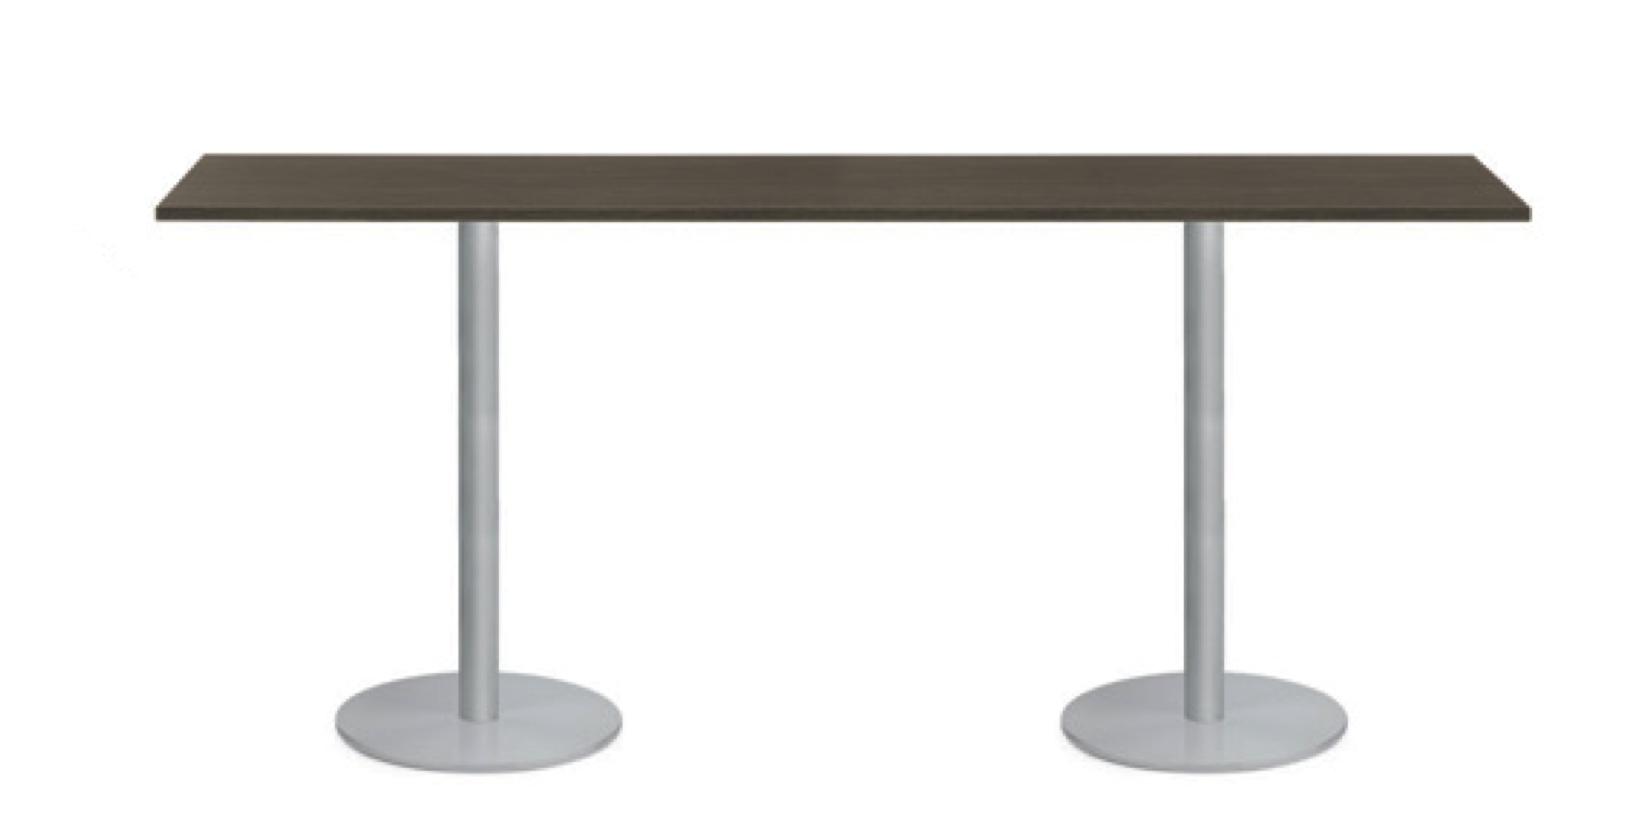 swap 8' standing table